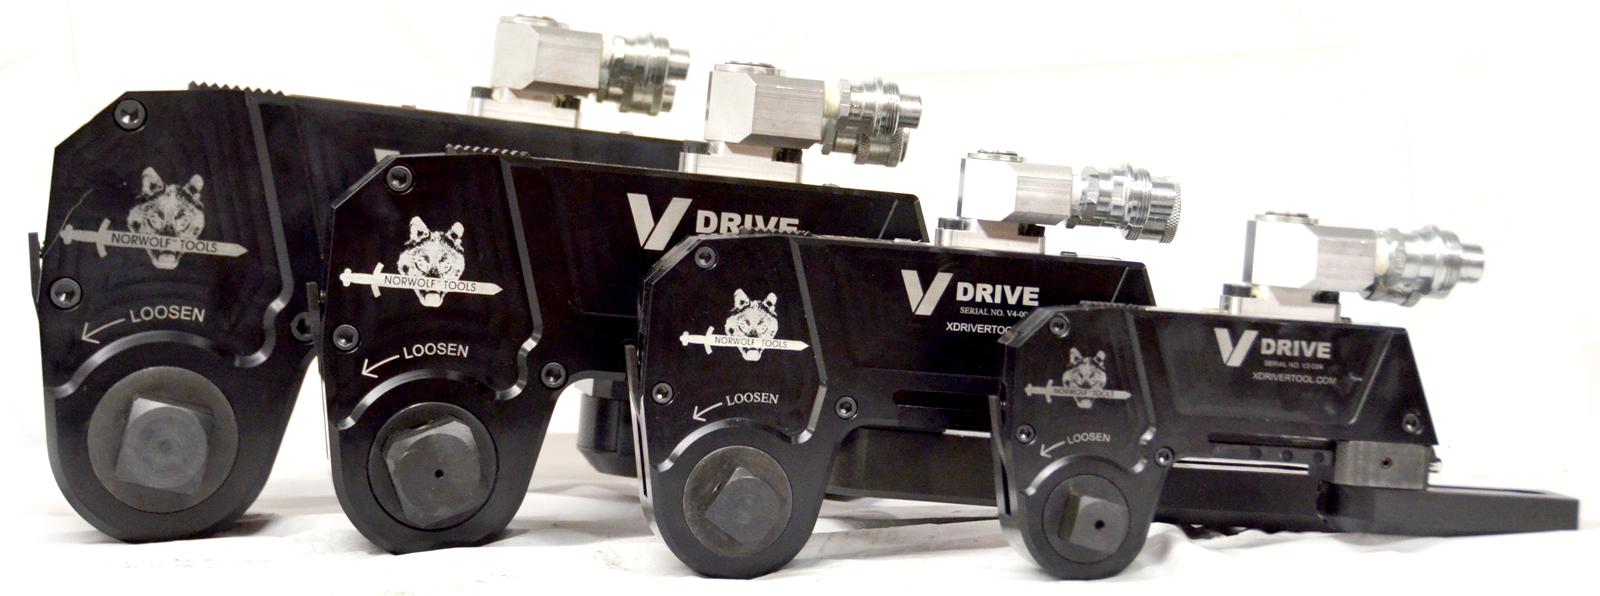 V-Drives-hdr